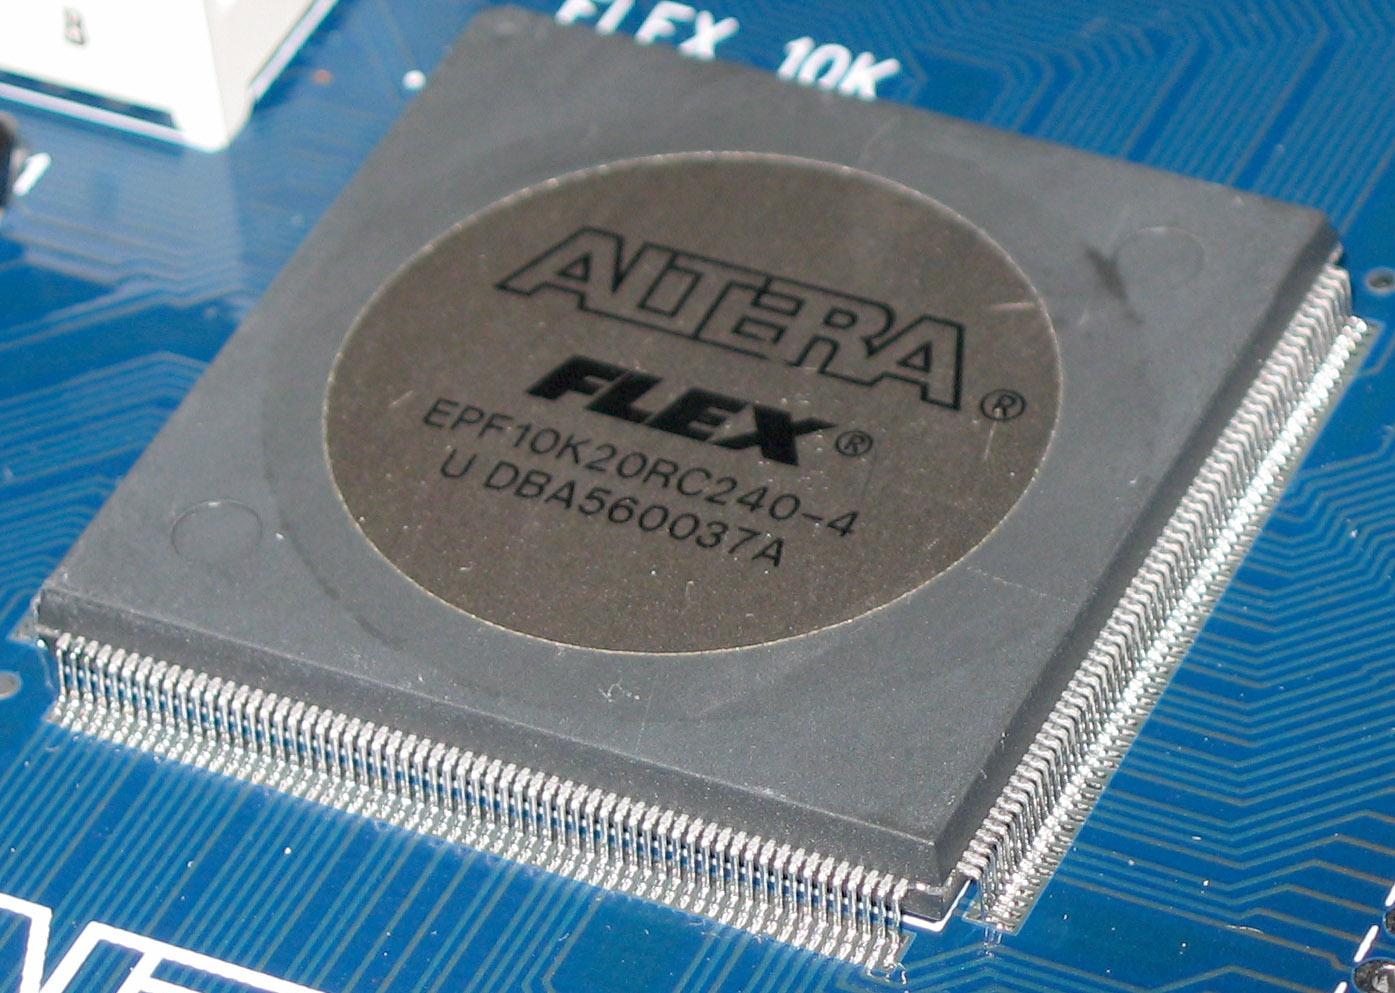 File:Altera Flex EPF10K20 20000 cell FPGA jpg - Wikimedia Commons